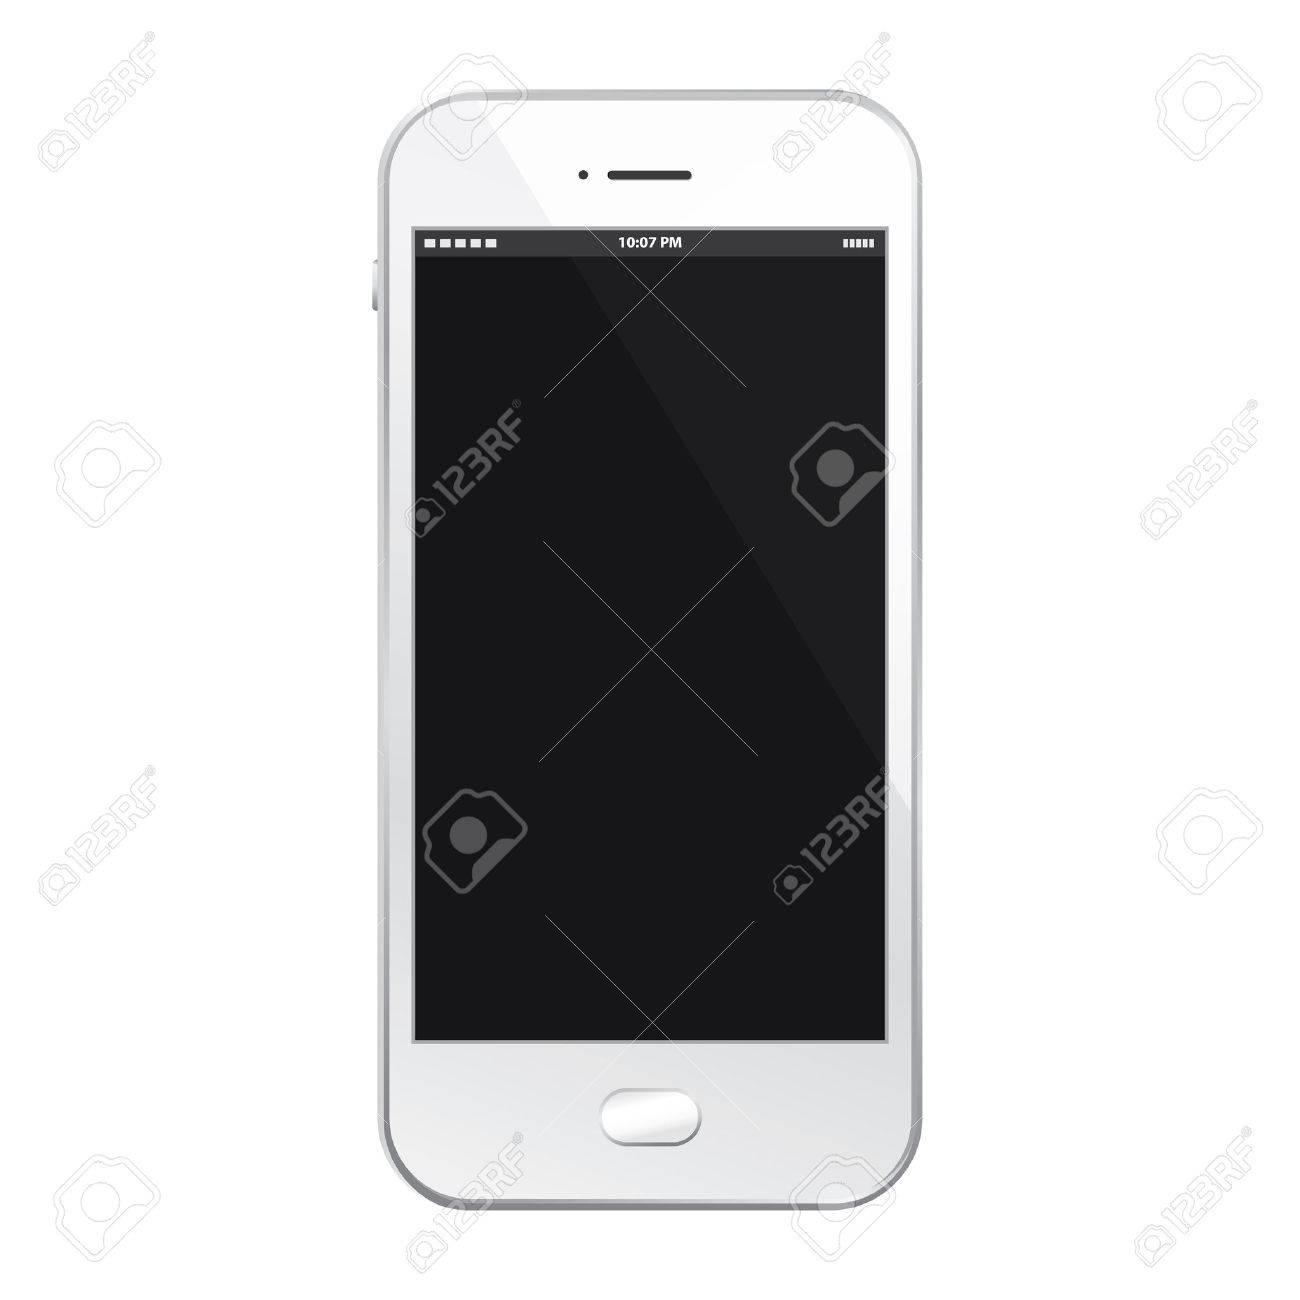 Mobile Phone - 36990823